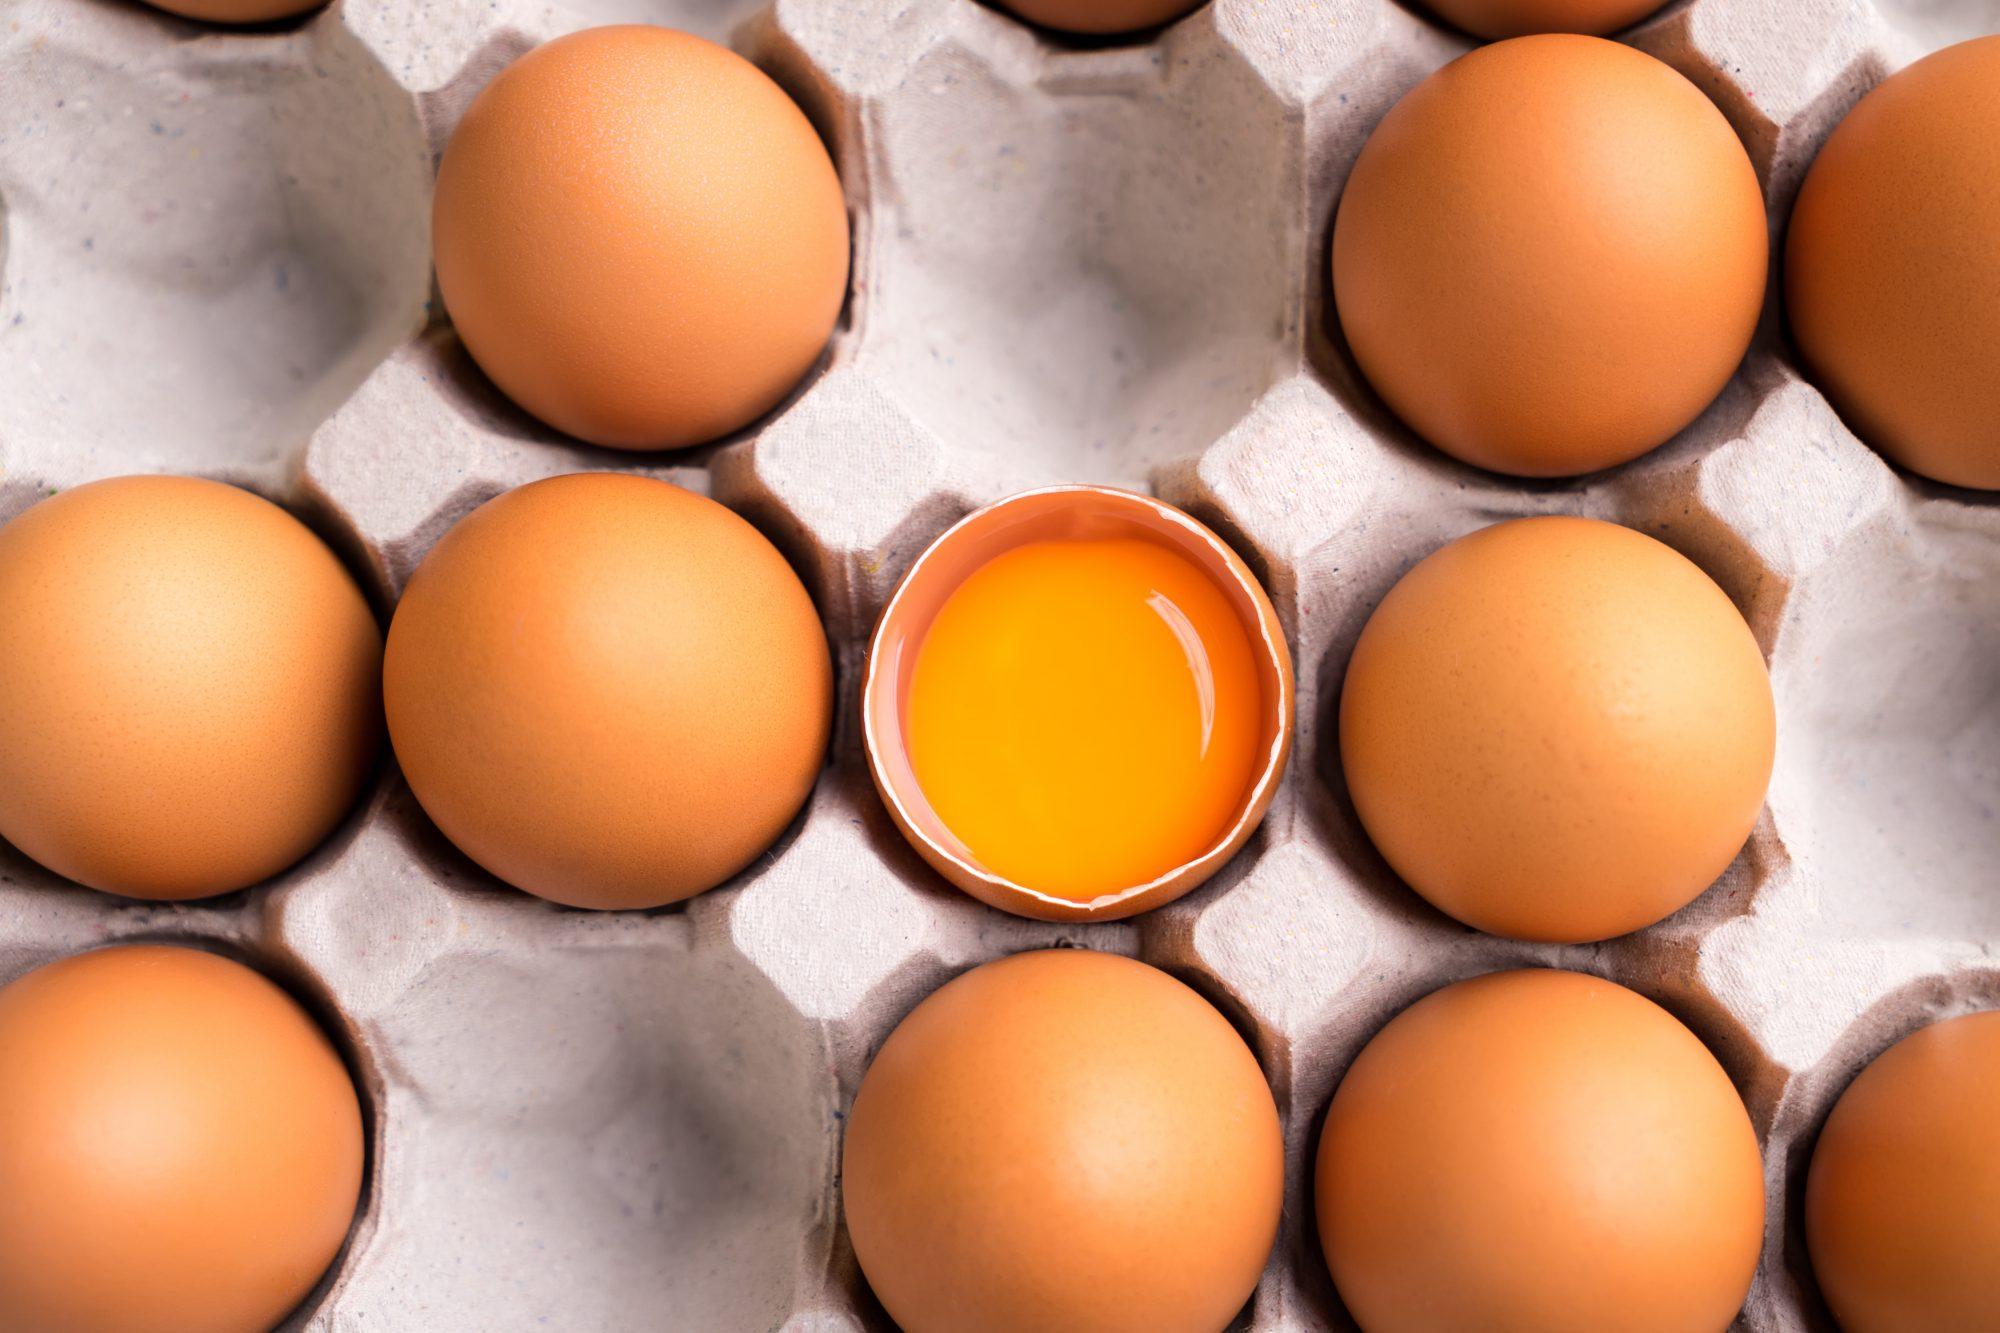 getty orange yolk image